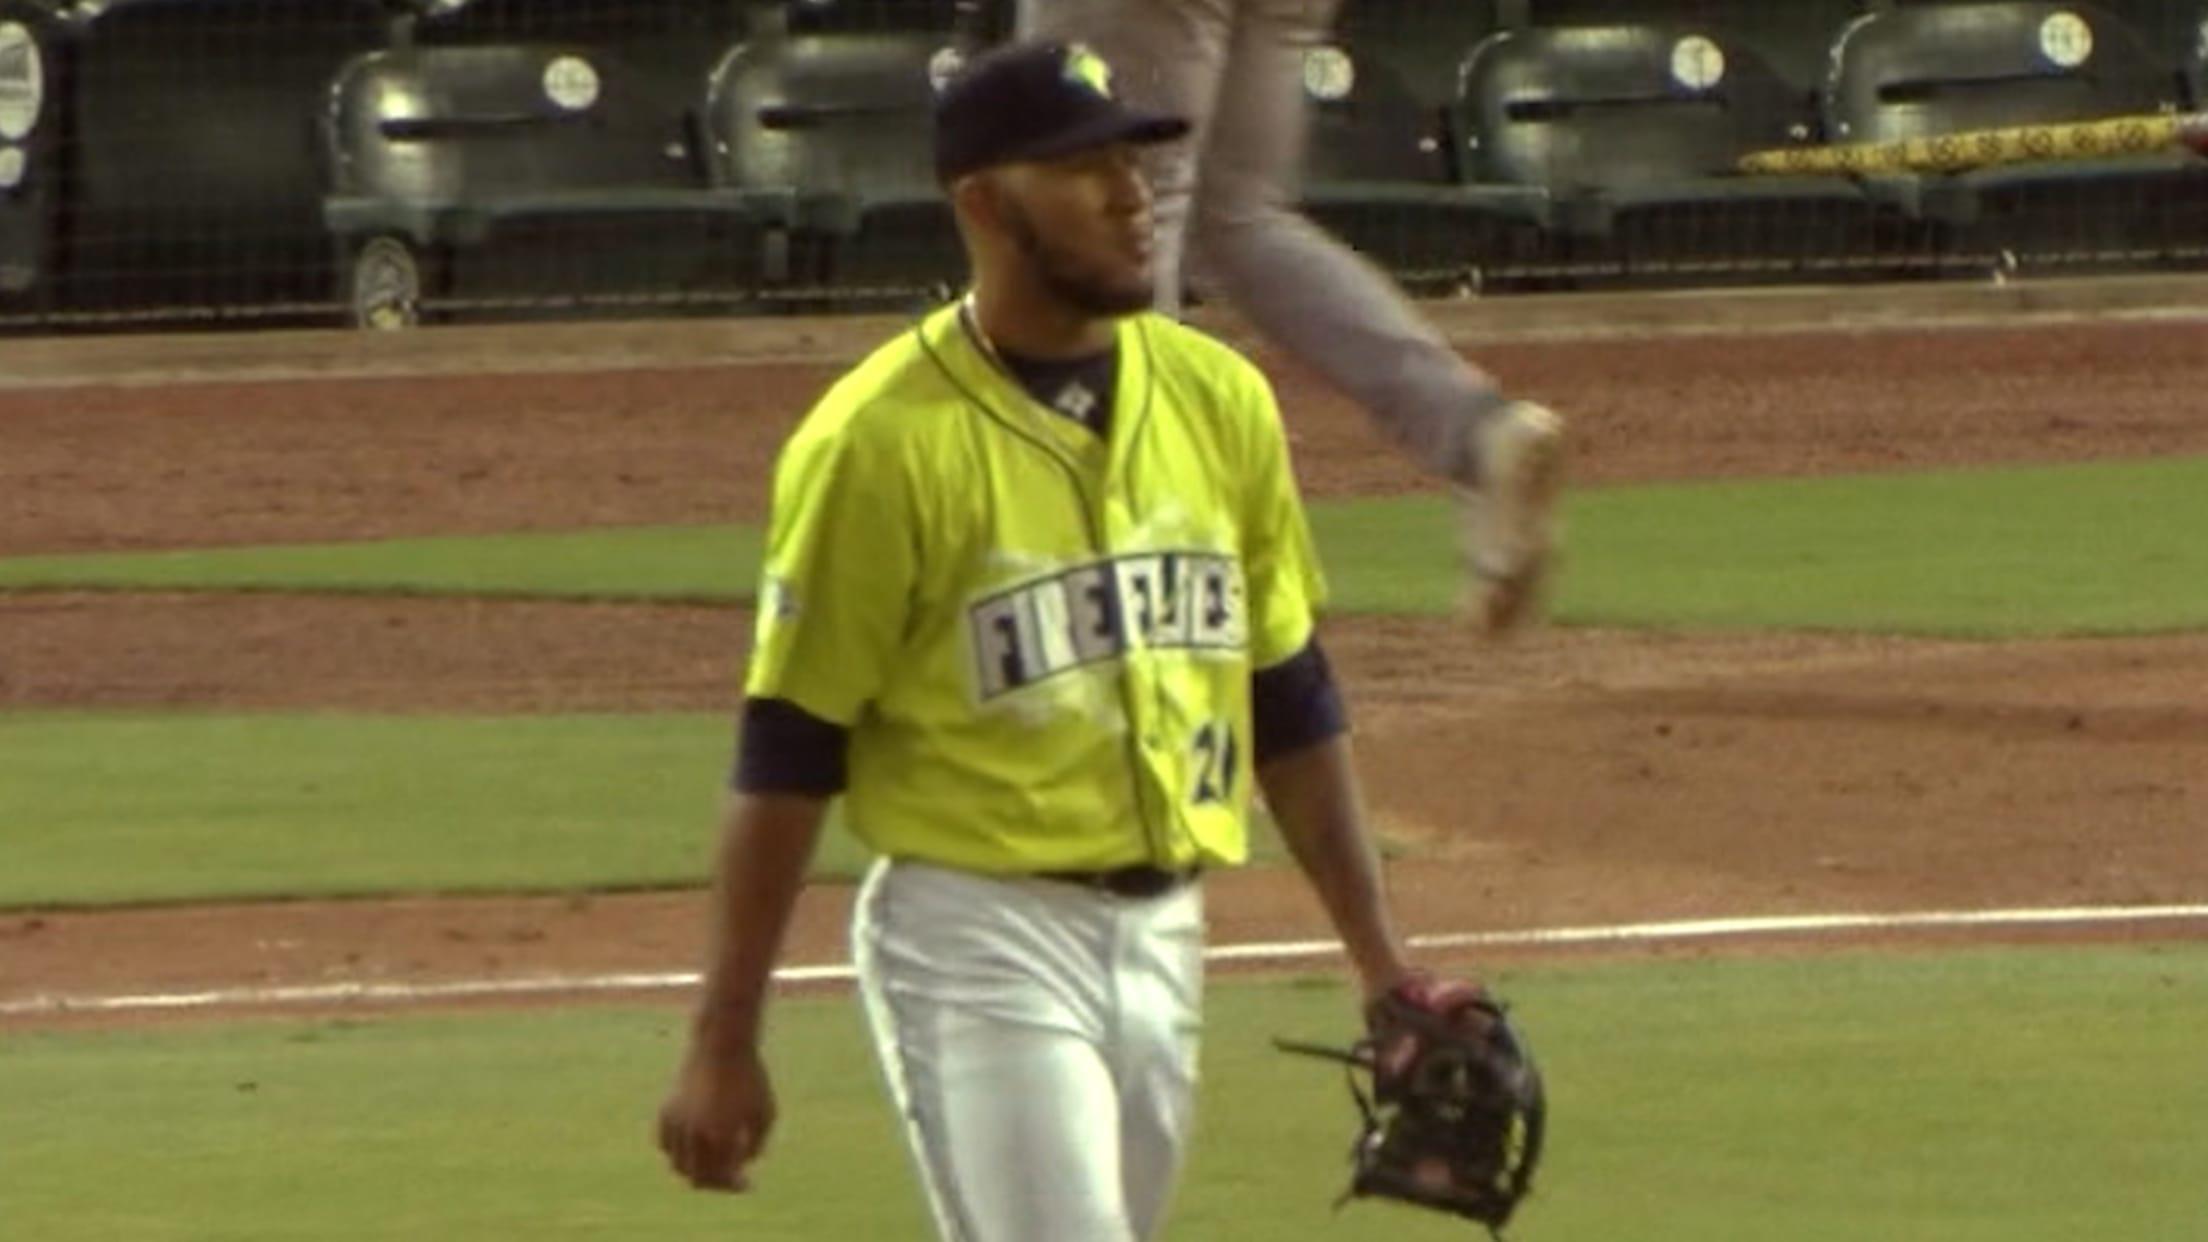 Top Prospects: Woods Richardson